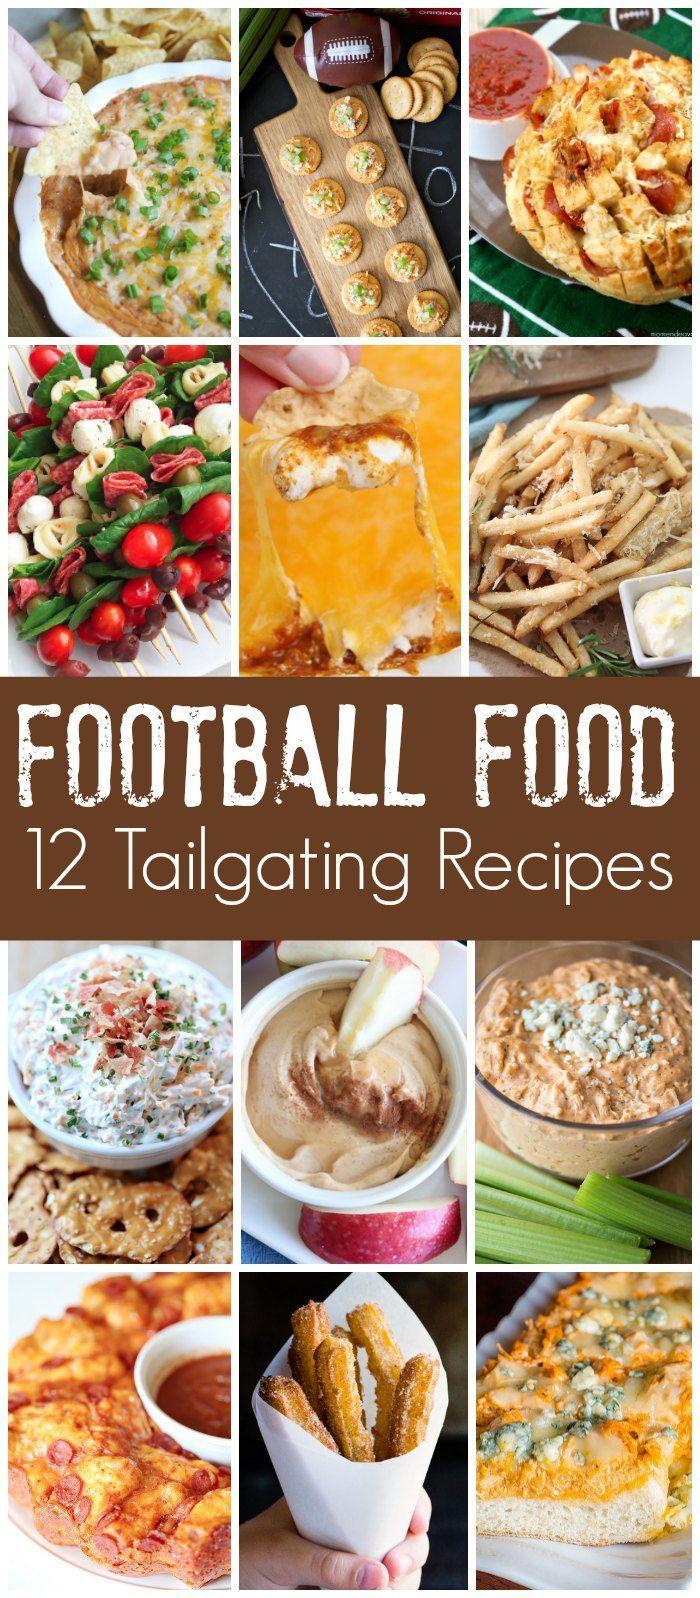 Football Food Tailgating Recipes